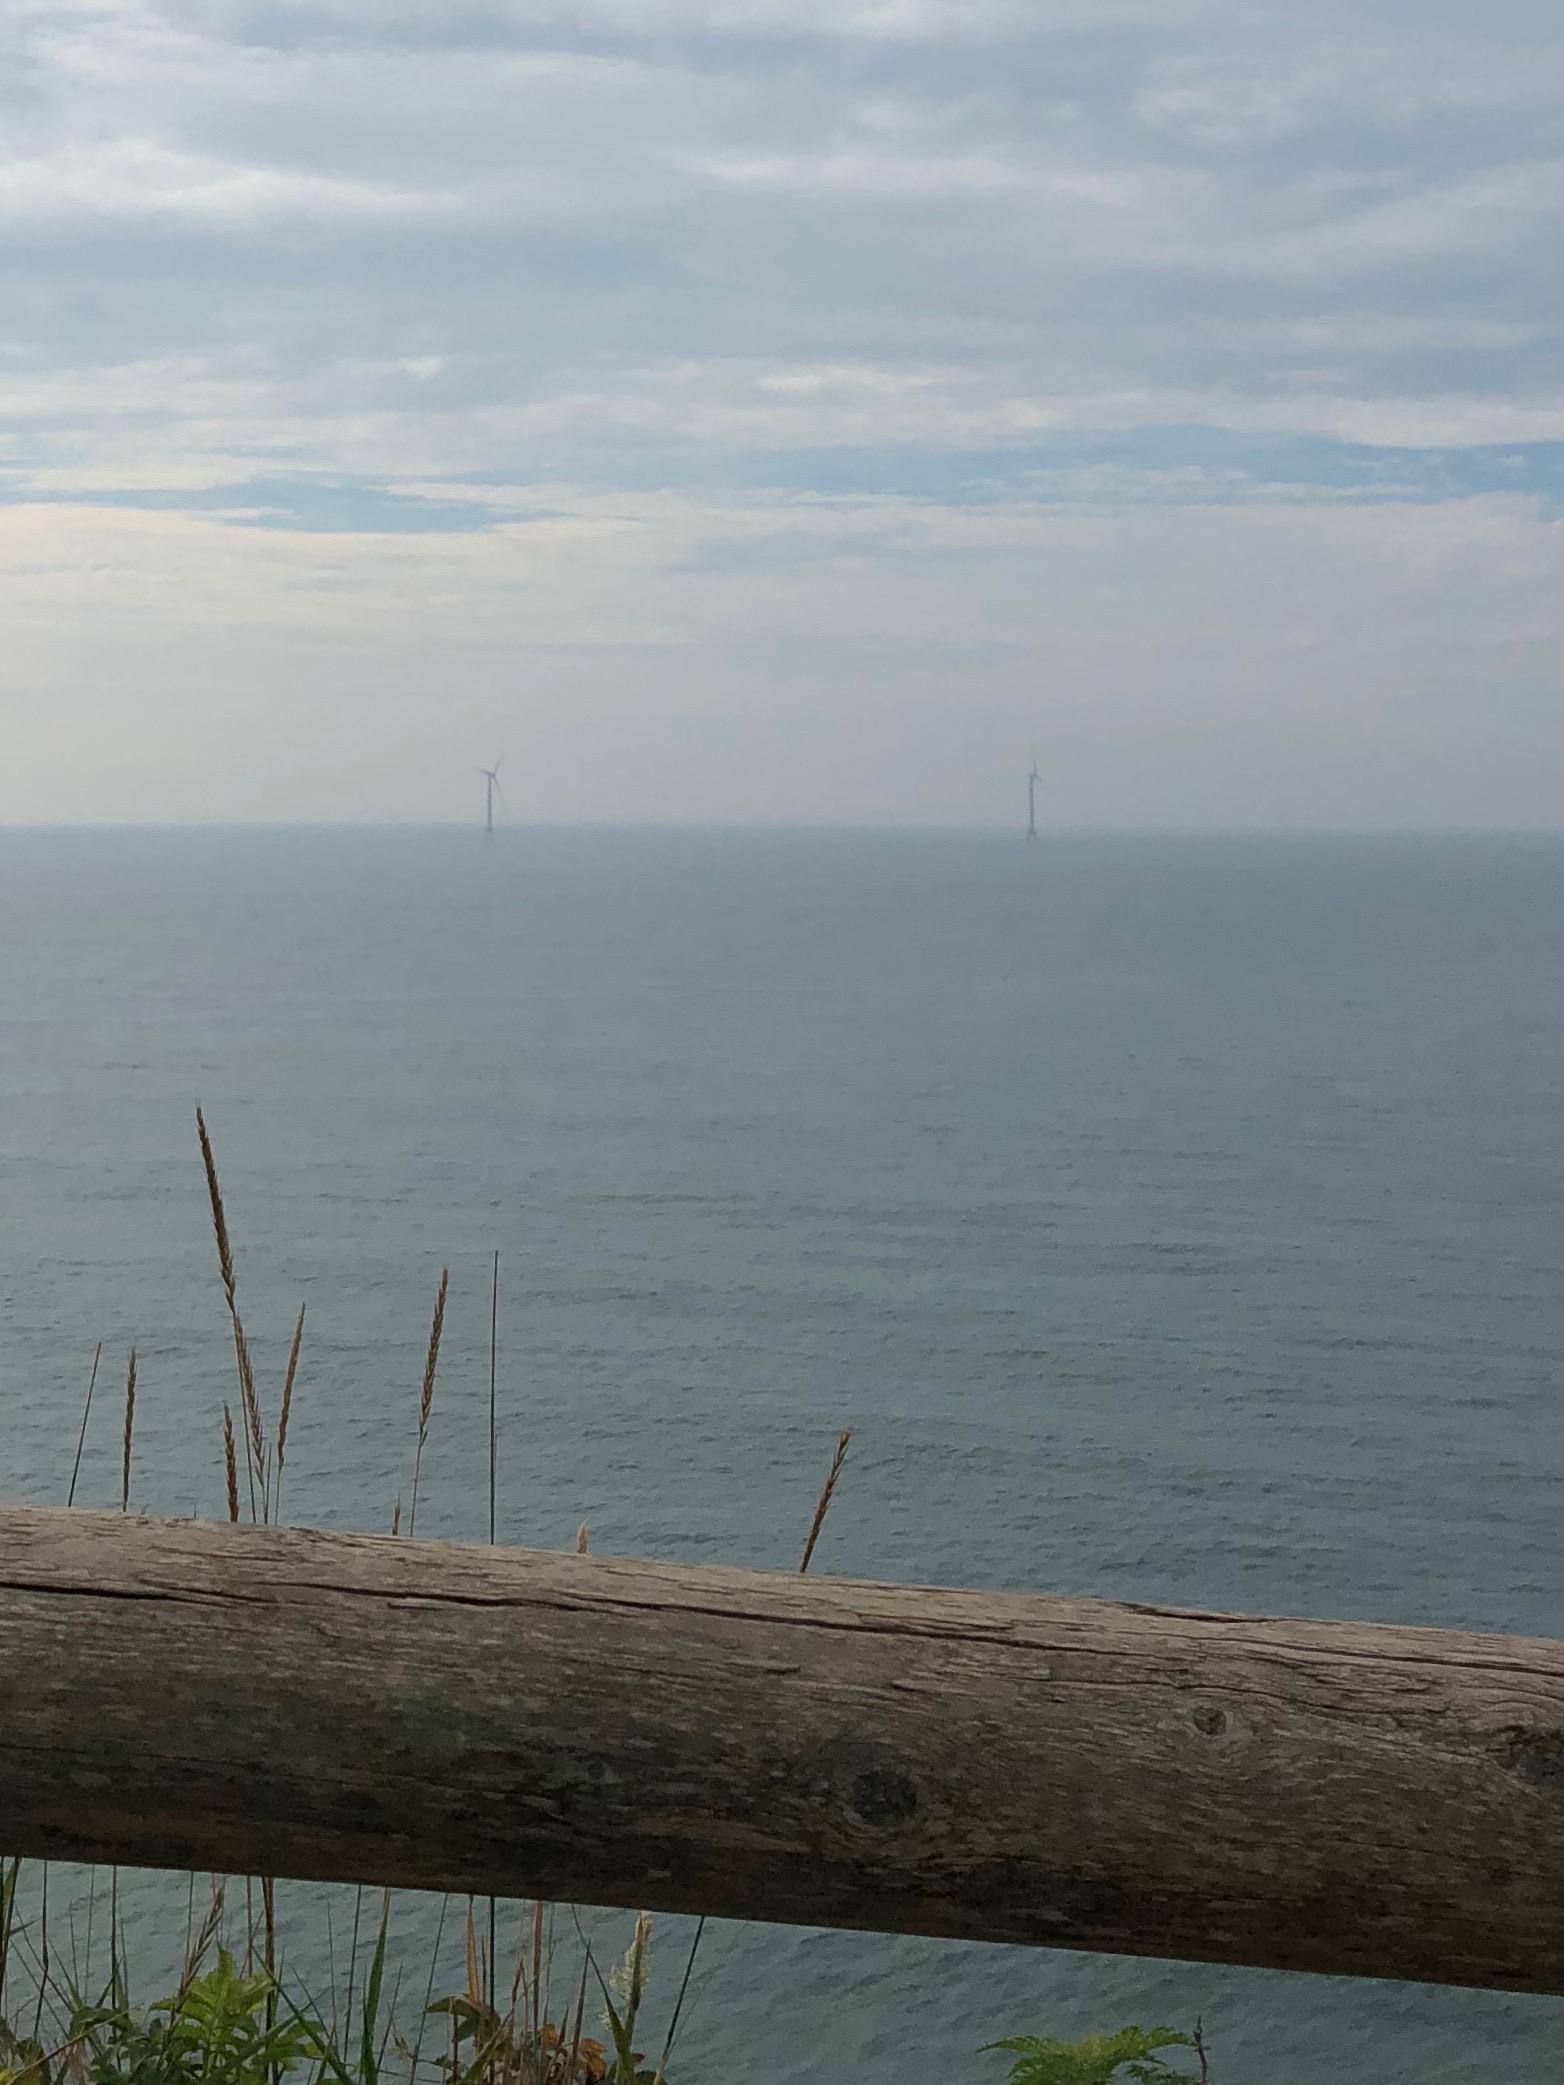 071518-windmills-look-carefully